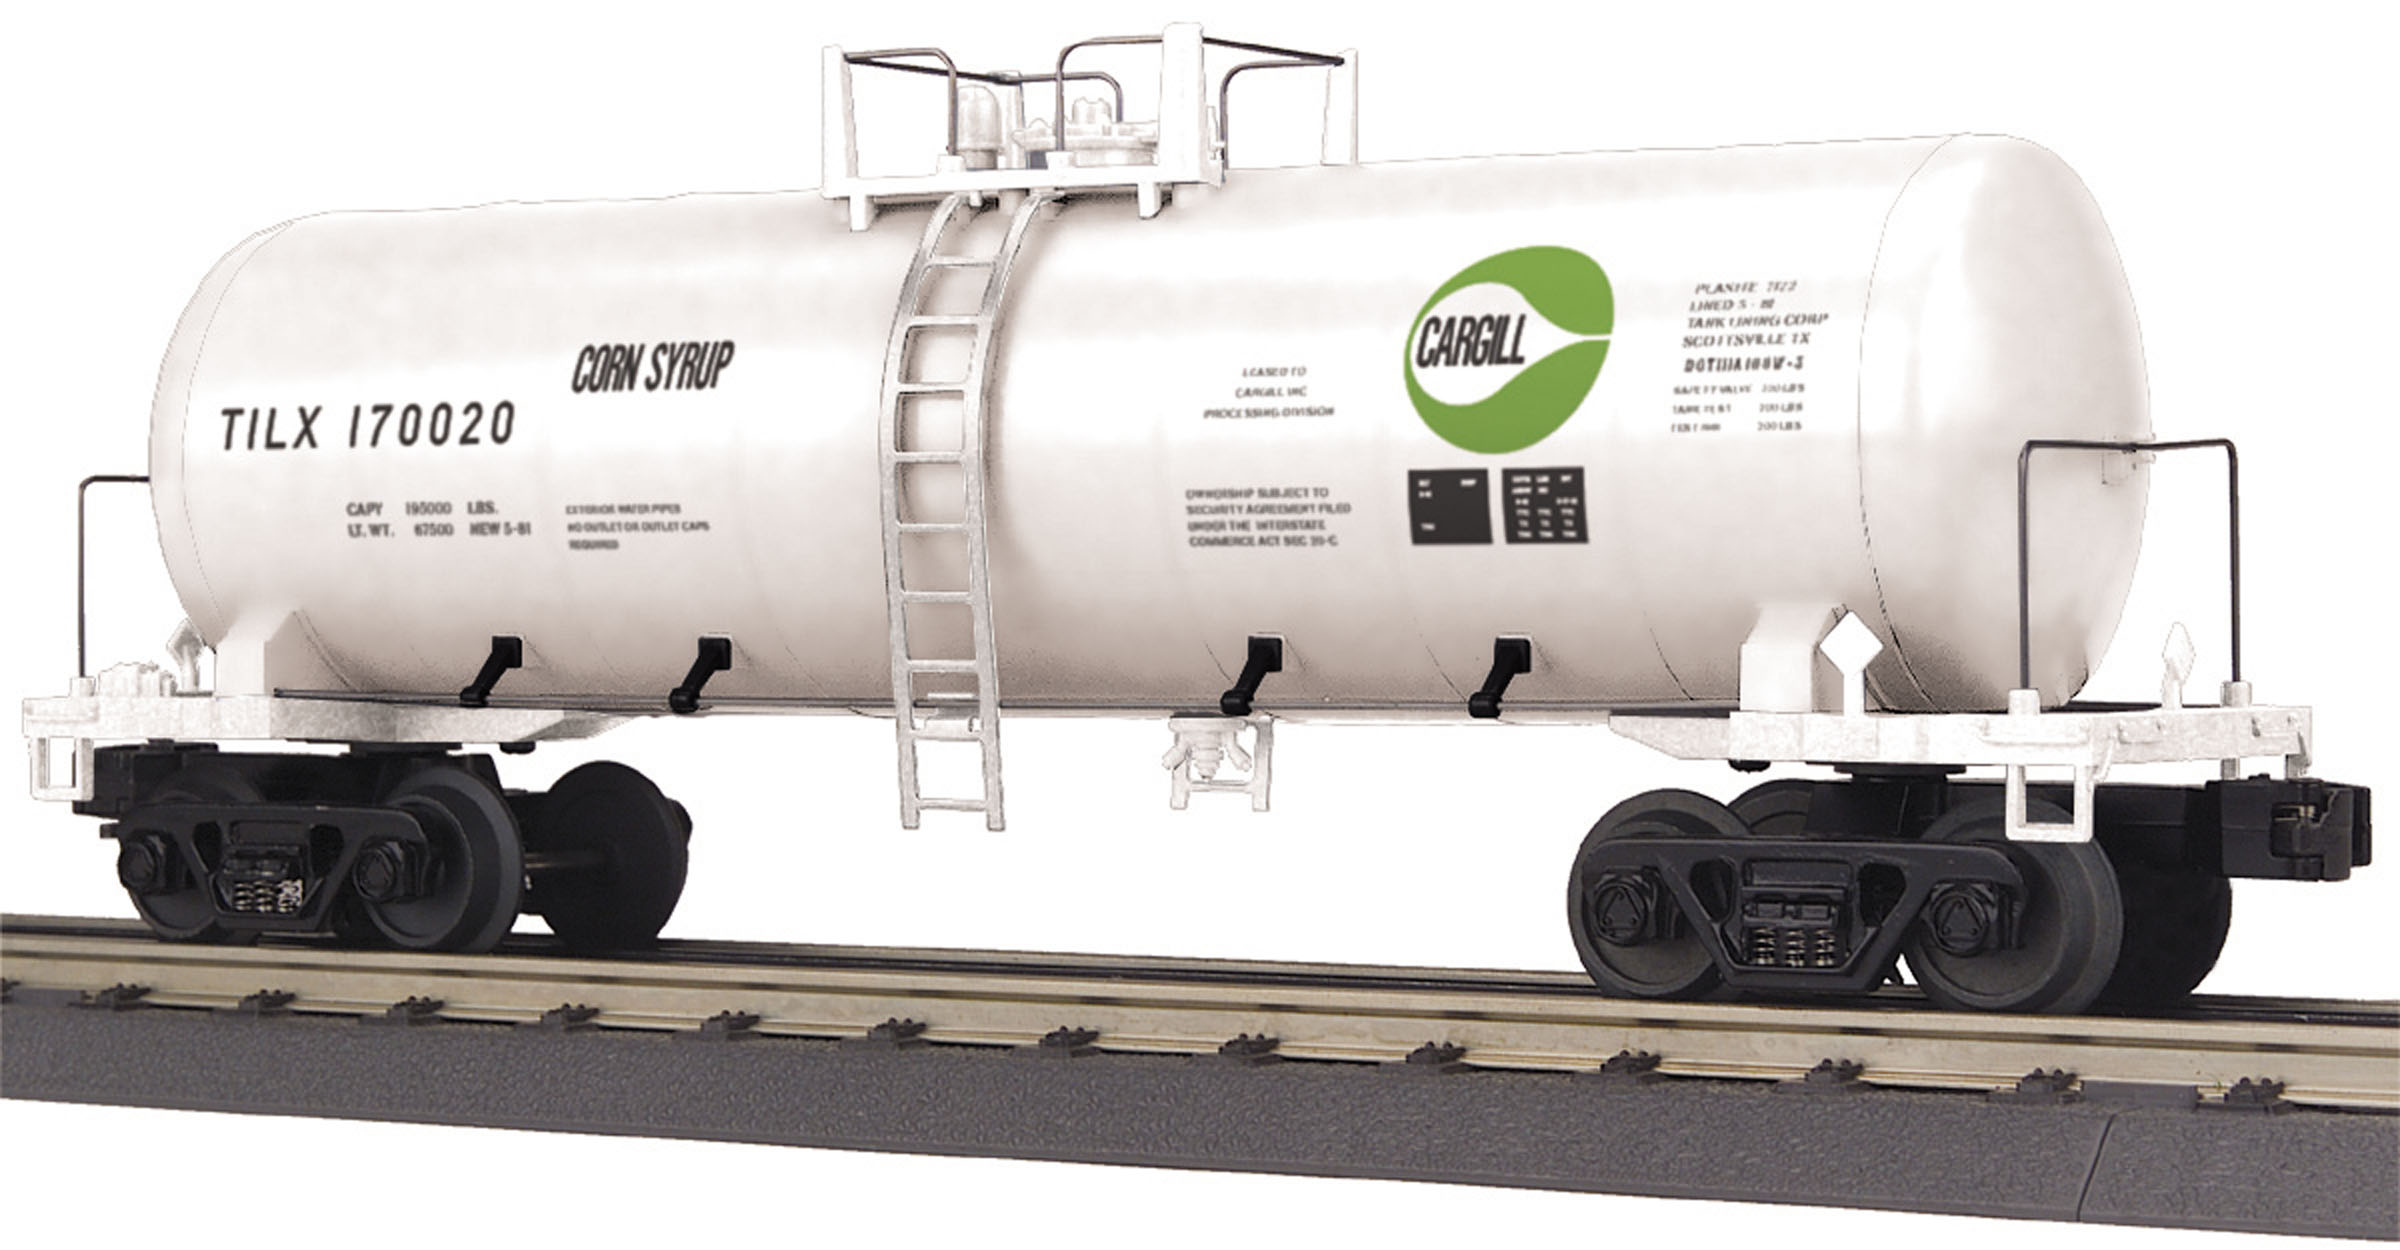 O Gauge RailKing Modern Tank Car Cargil Modern Tank Car - Cargil Car No.  170020 . e34f0ac32b